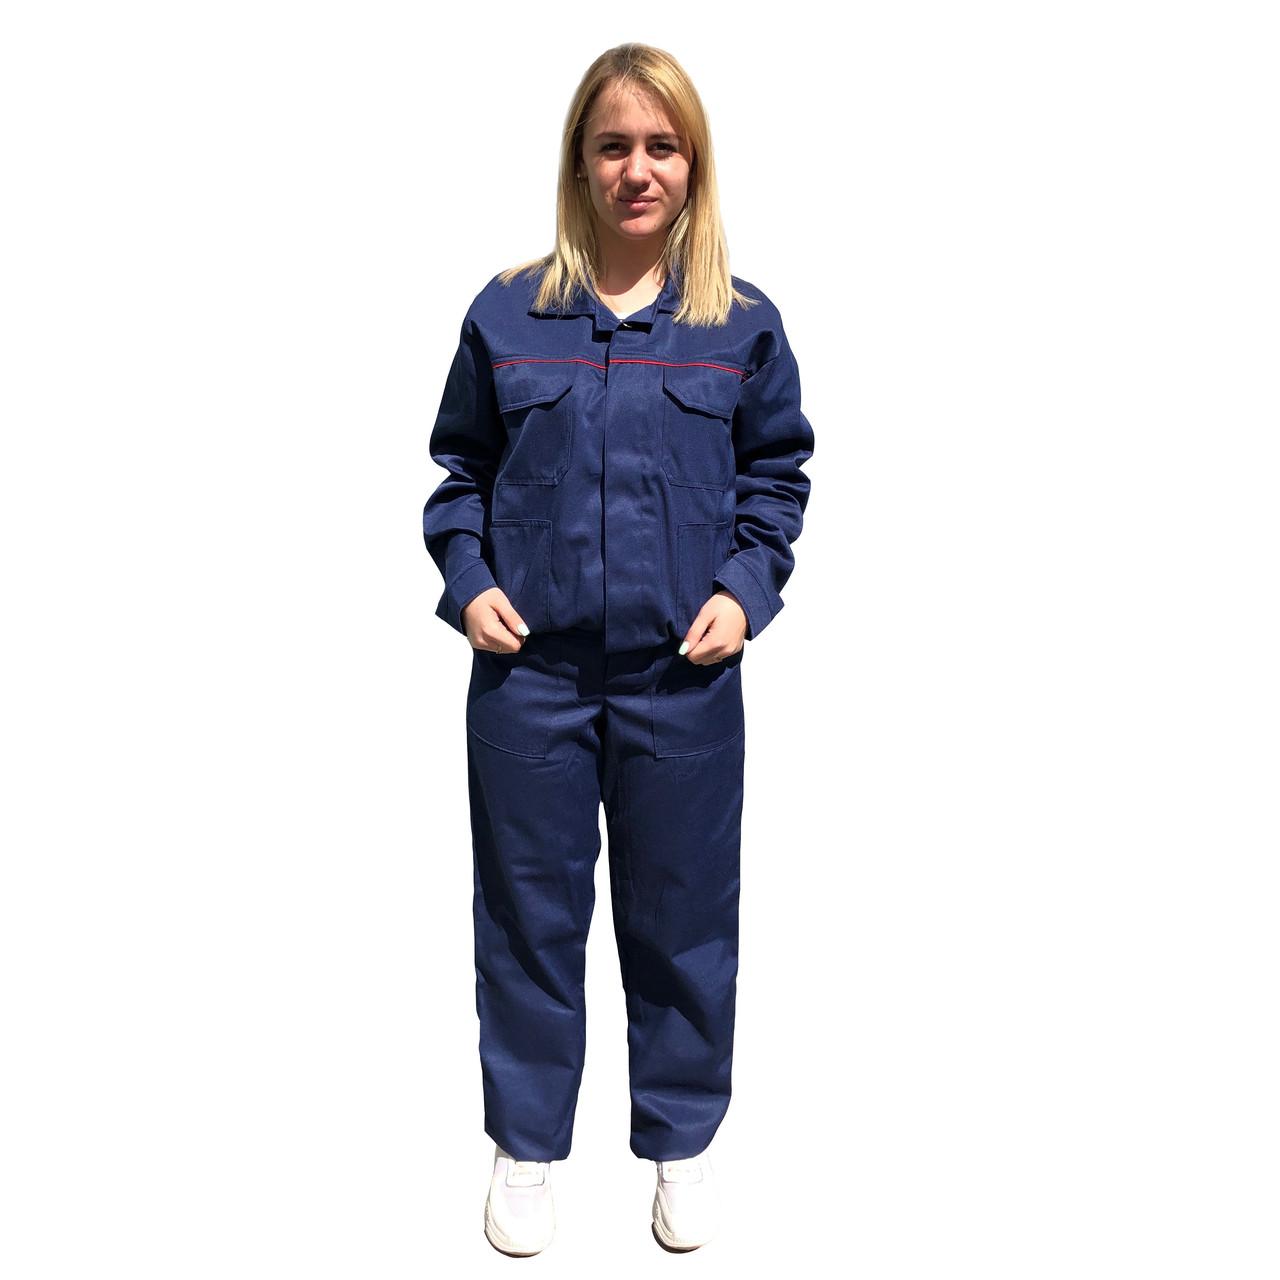 Костюм рабочий (брюки+куртка), т.синий, грета 210 г/м2